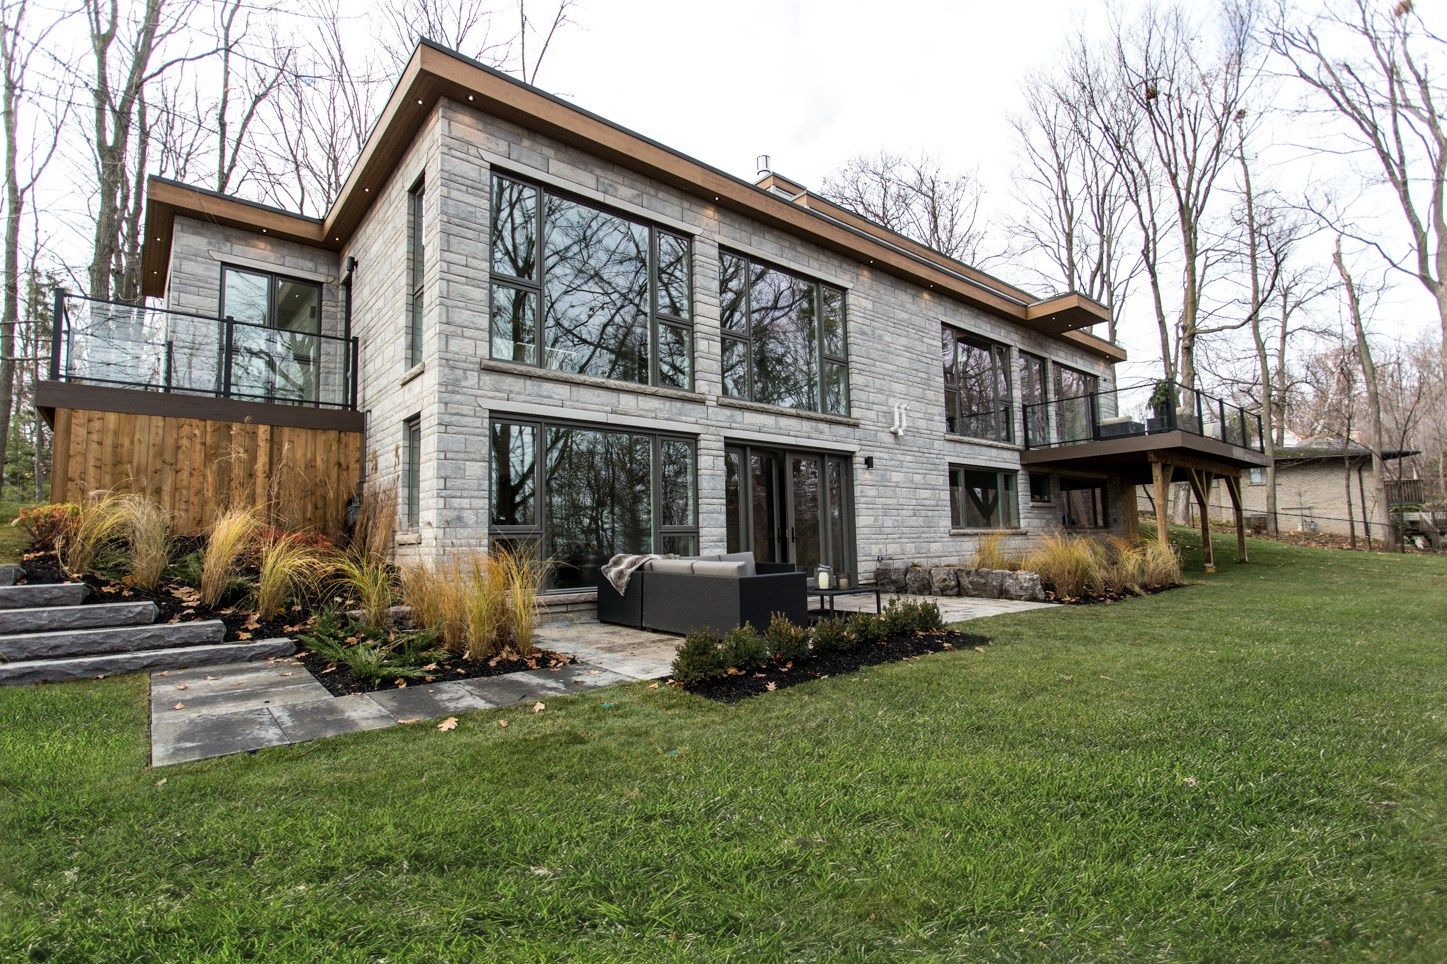 Bryan And Sarah Baeumler Unveil Their Gorgeous Highview Property Dream House Exterior House Exterior New House Plans